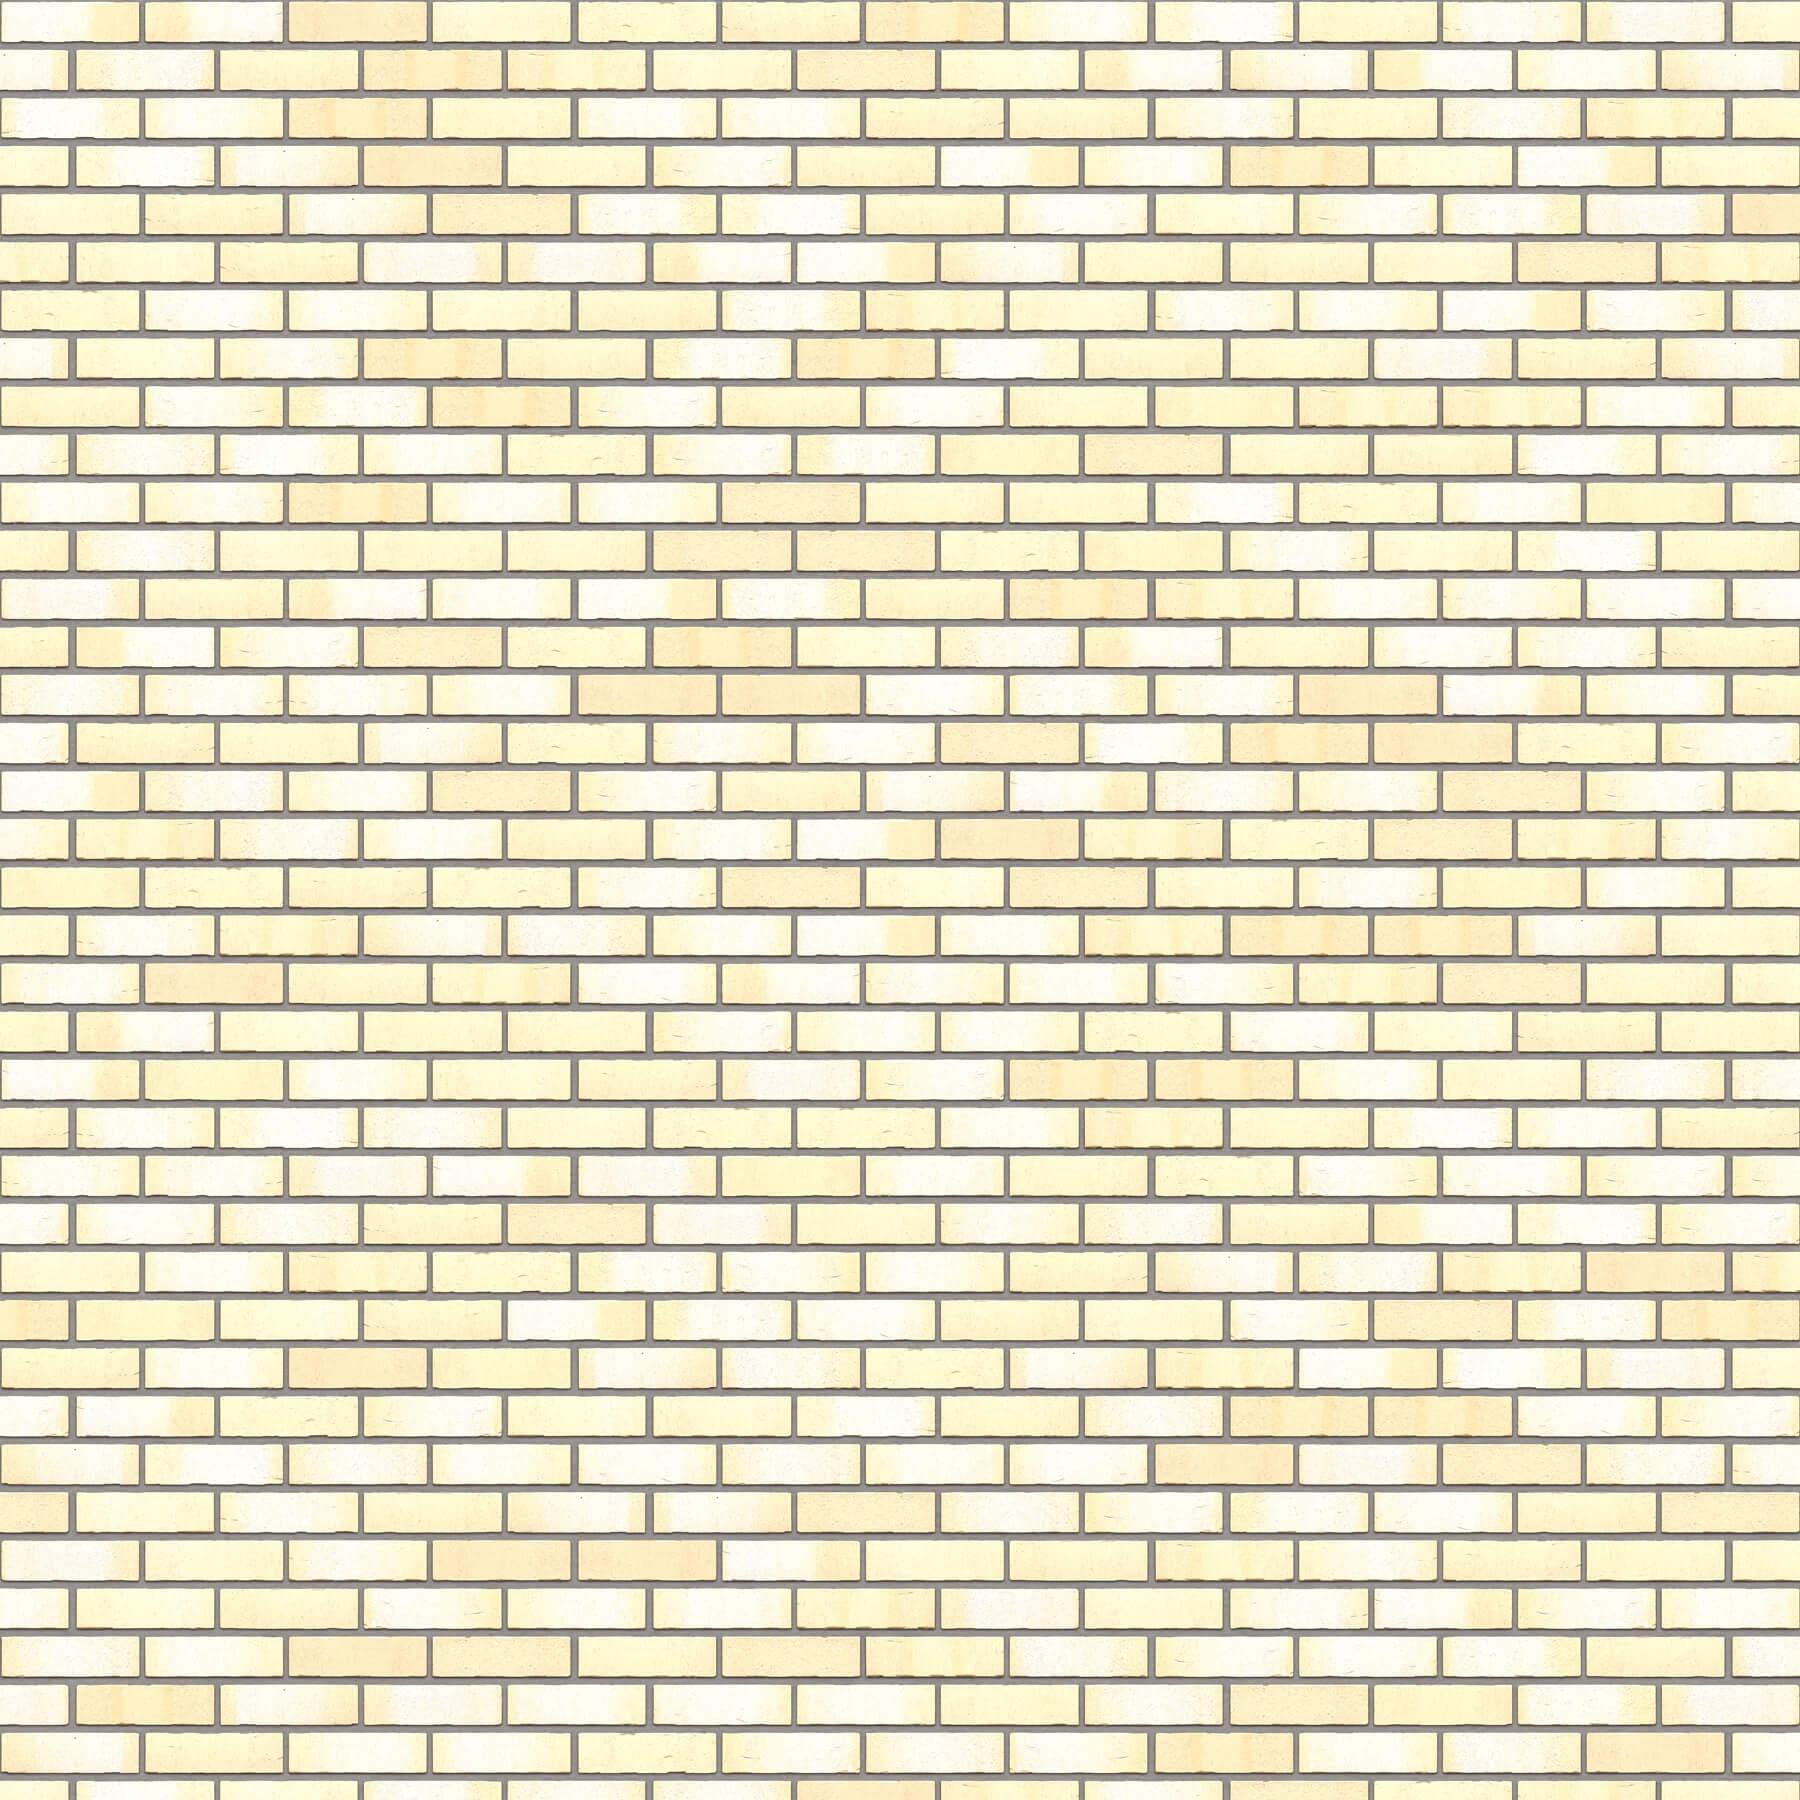 Dekorativna cigla listela FeldHaus Klinker r-733 nf Siva Fuga